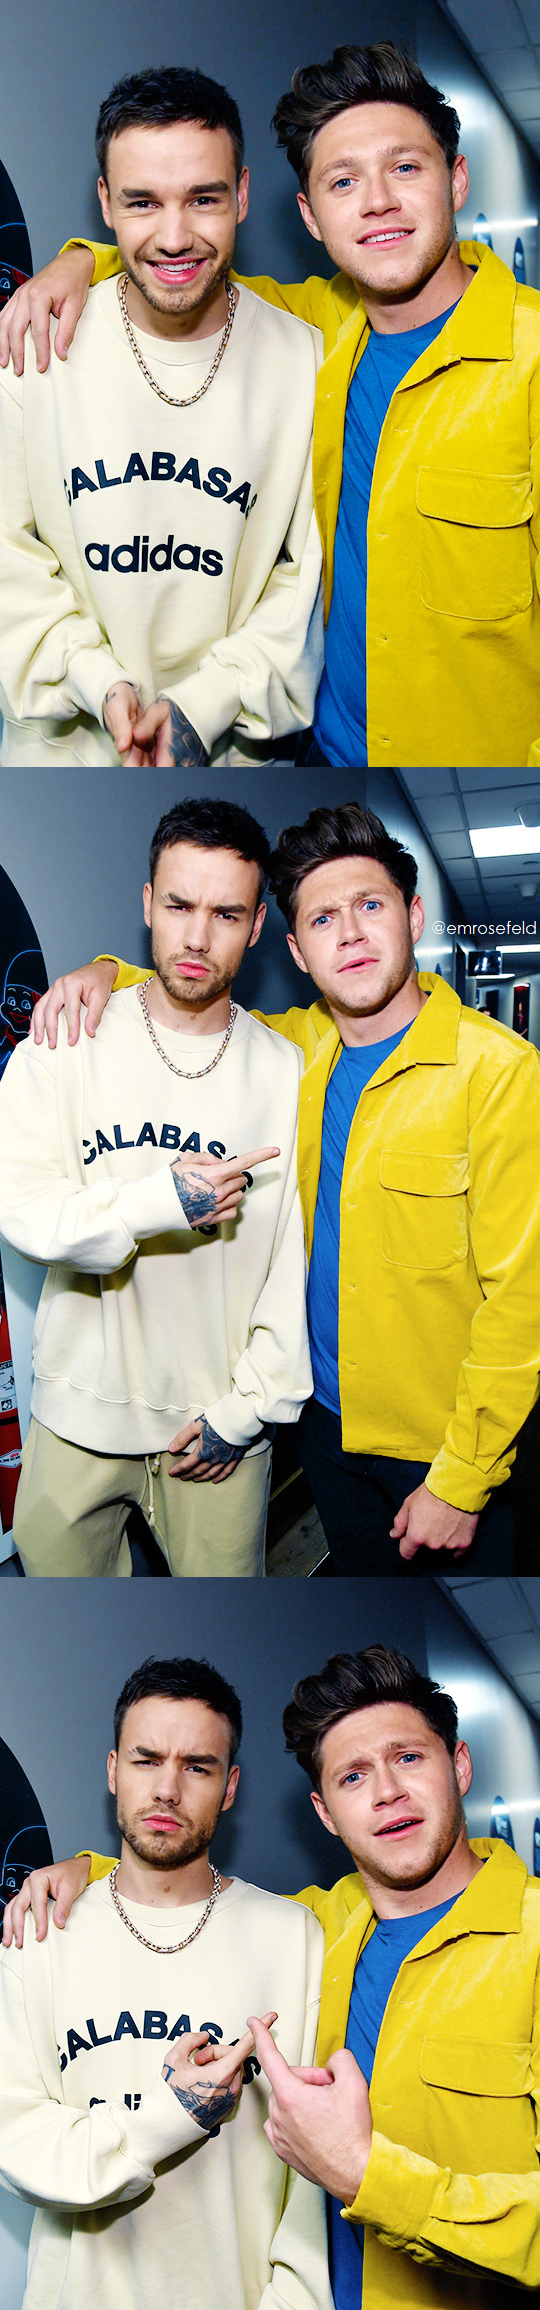 Niall Horan & Liam Payne | Jingle Ball LA 12.1.17 | emrosefeld | #liampayne